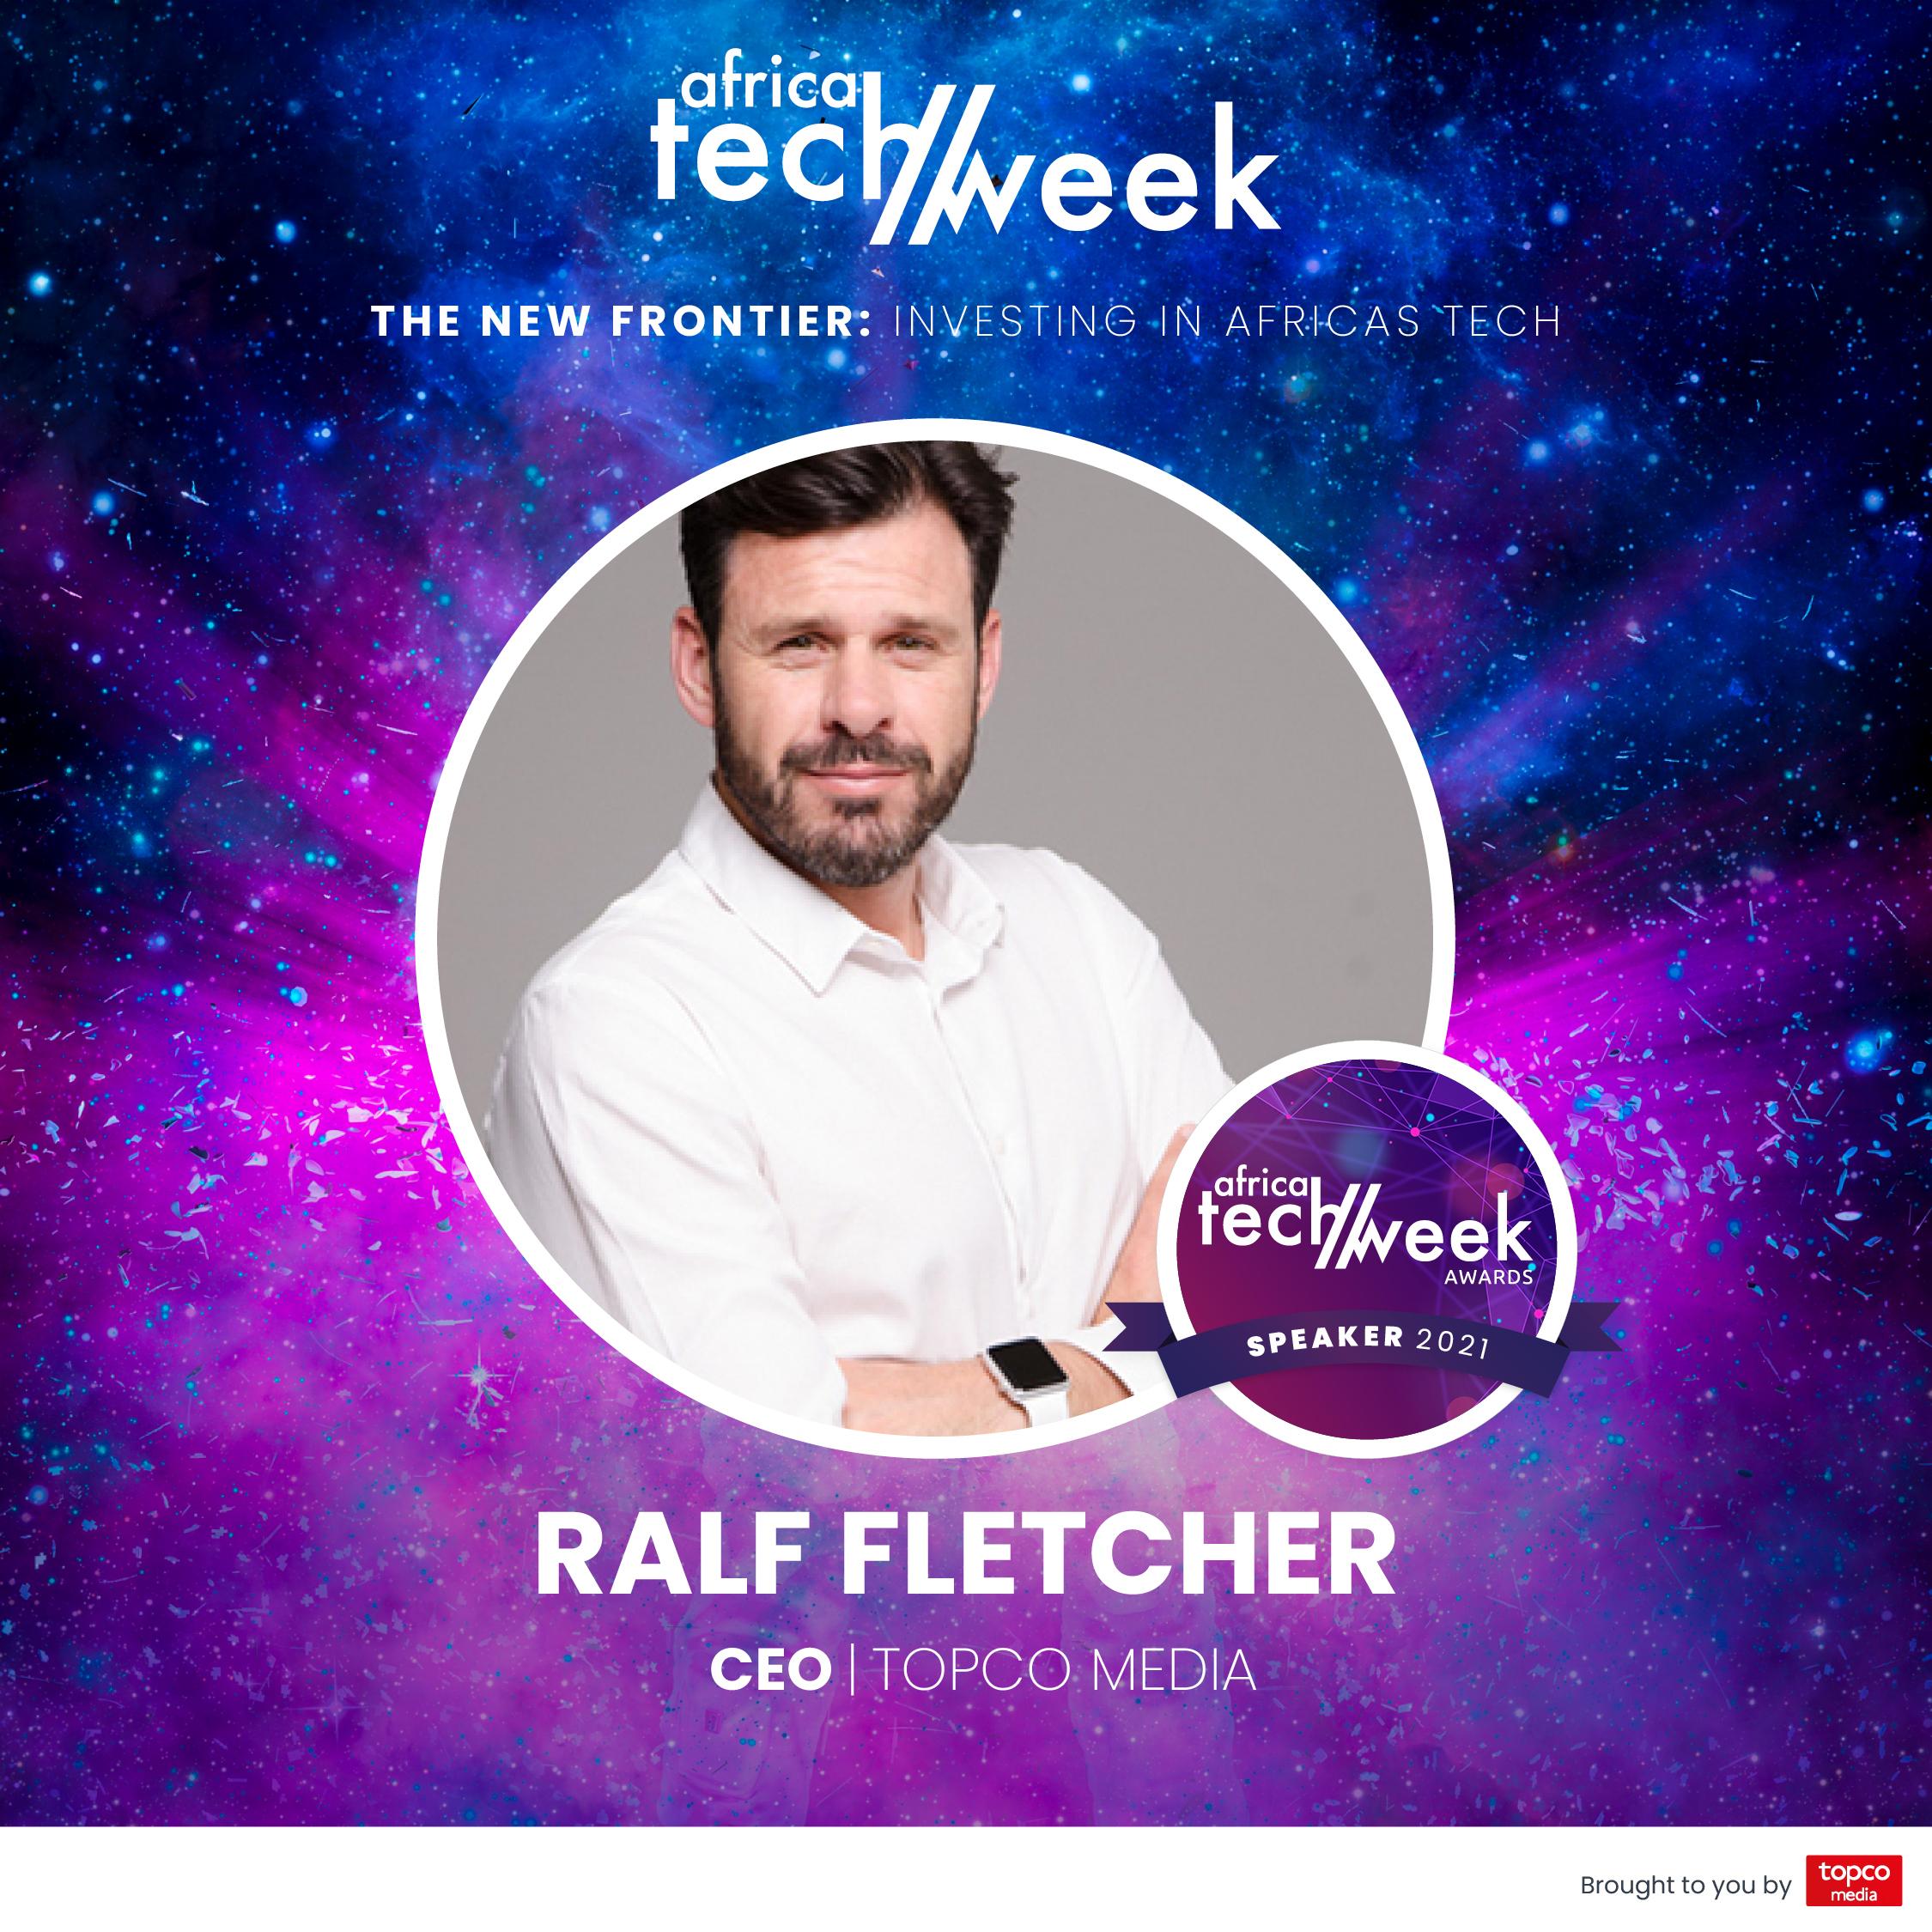 Ralf Fletcher